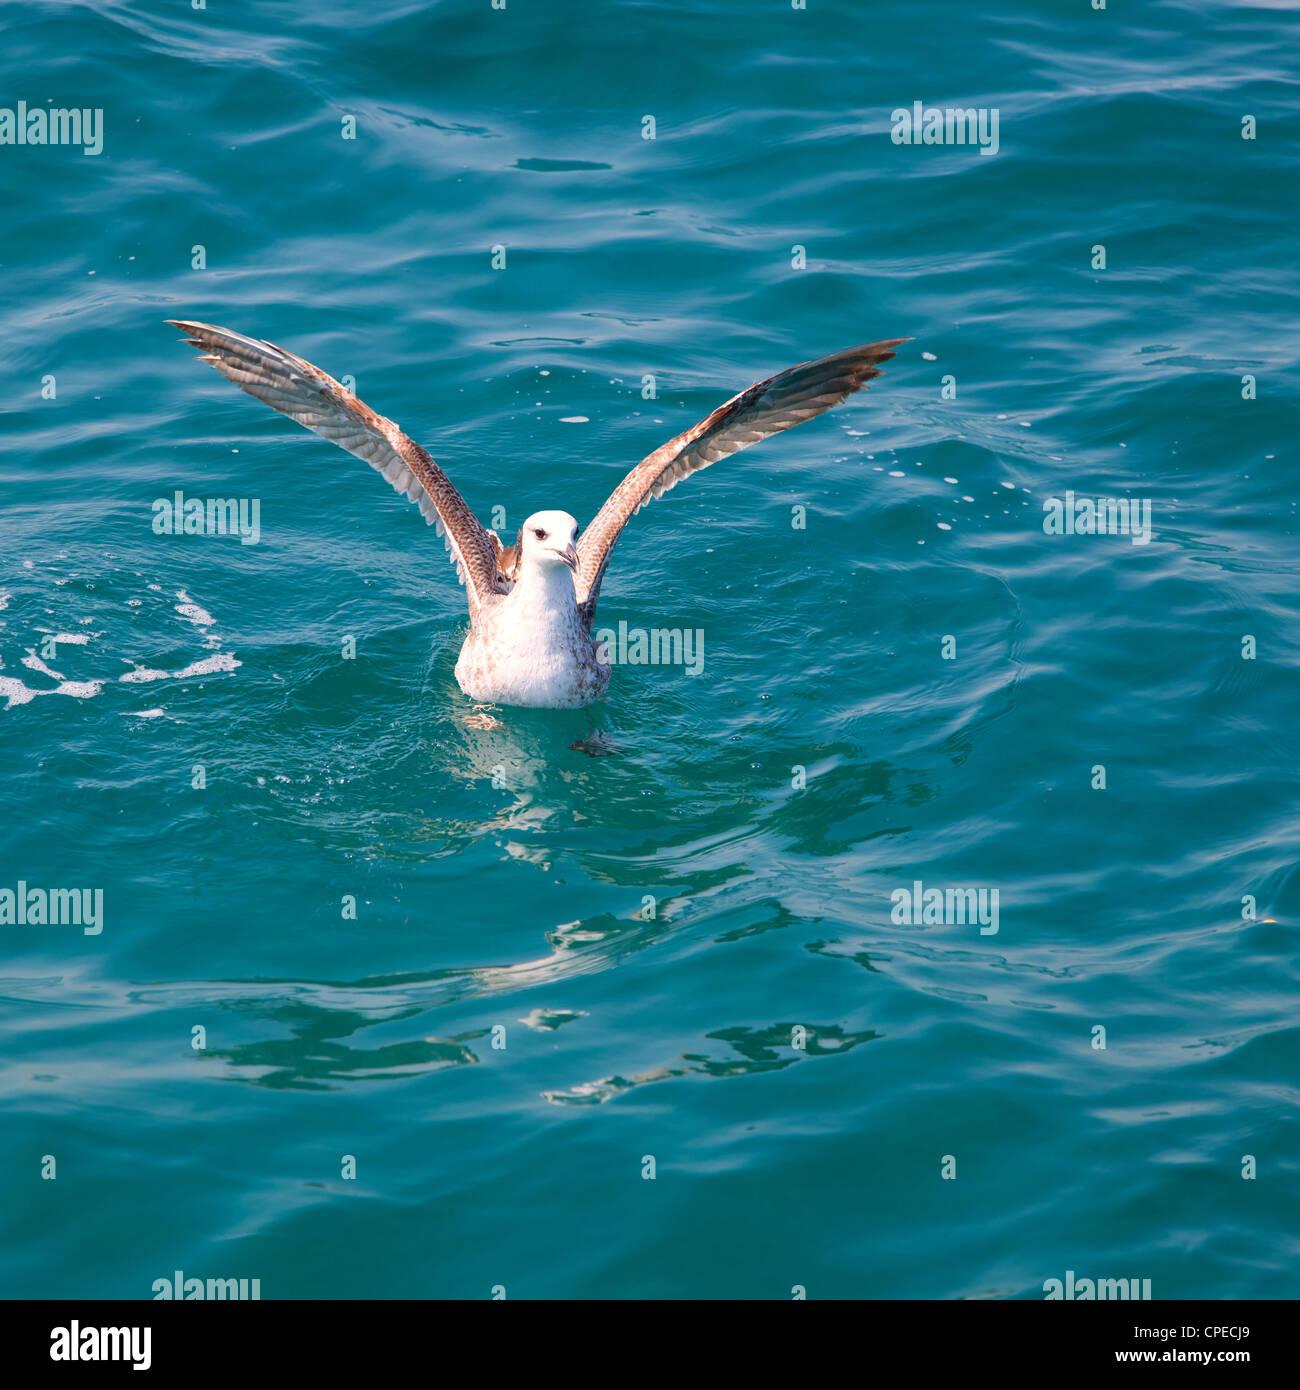 bird seagull on sea water in blue ocean - Stock Image